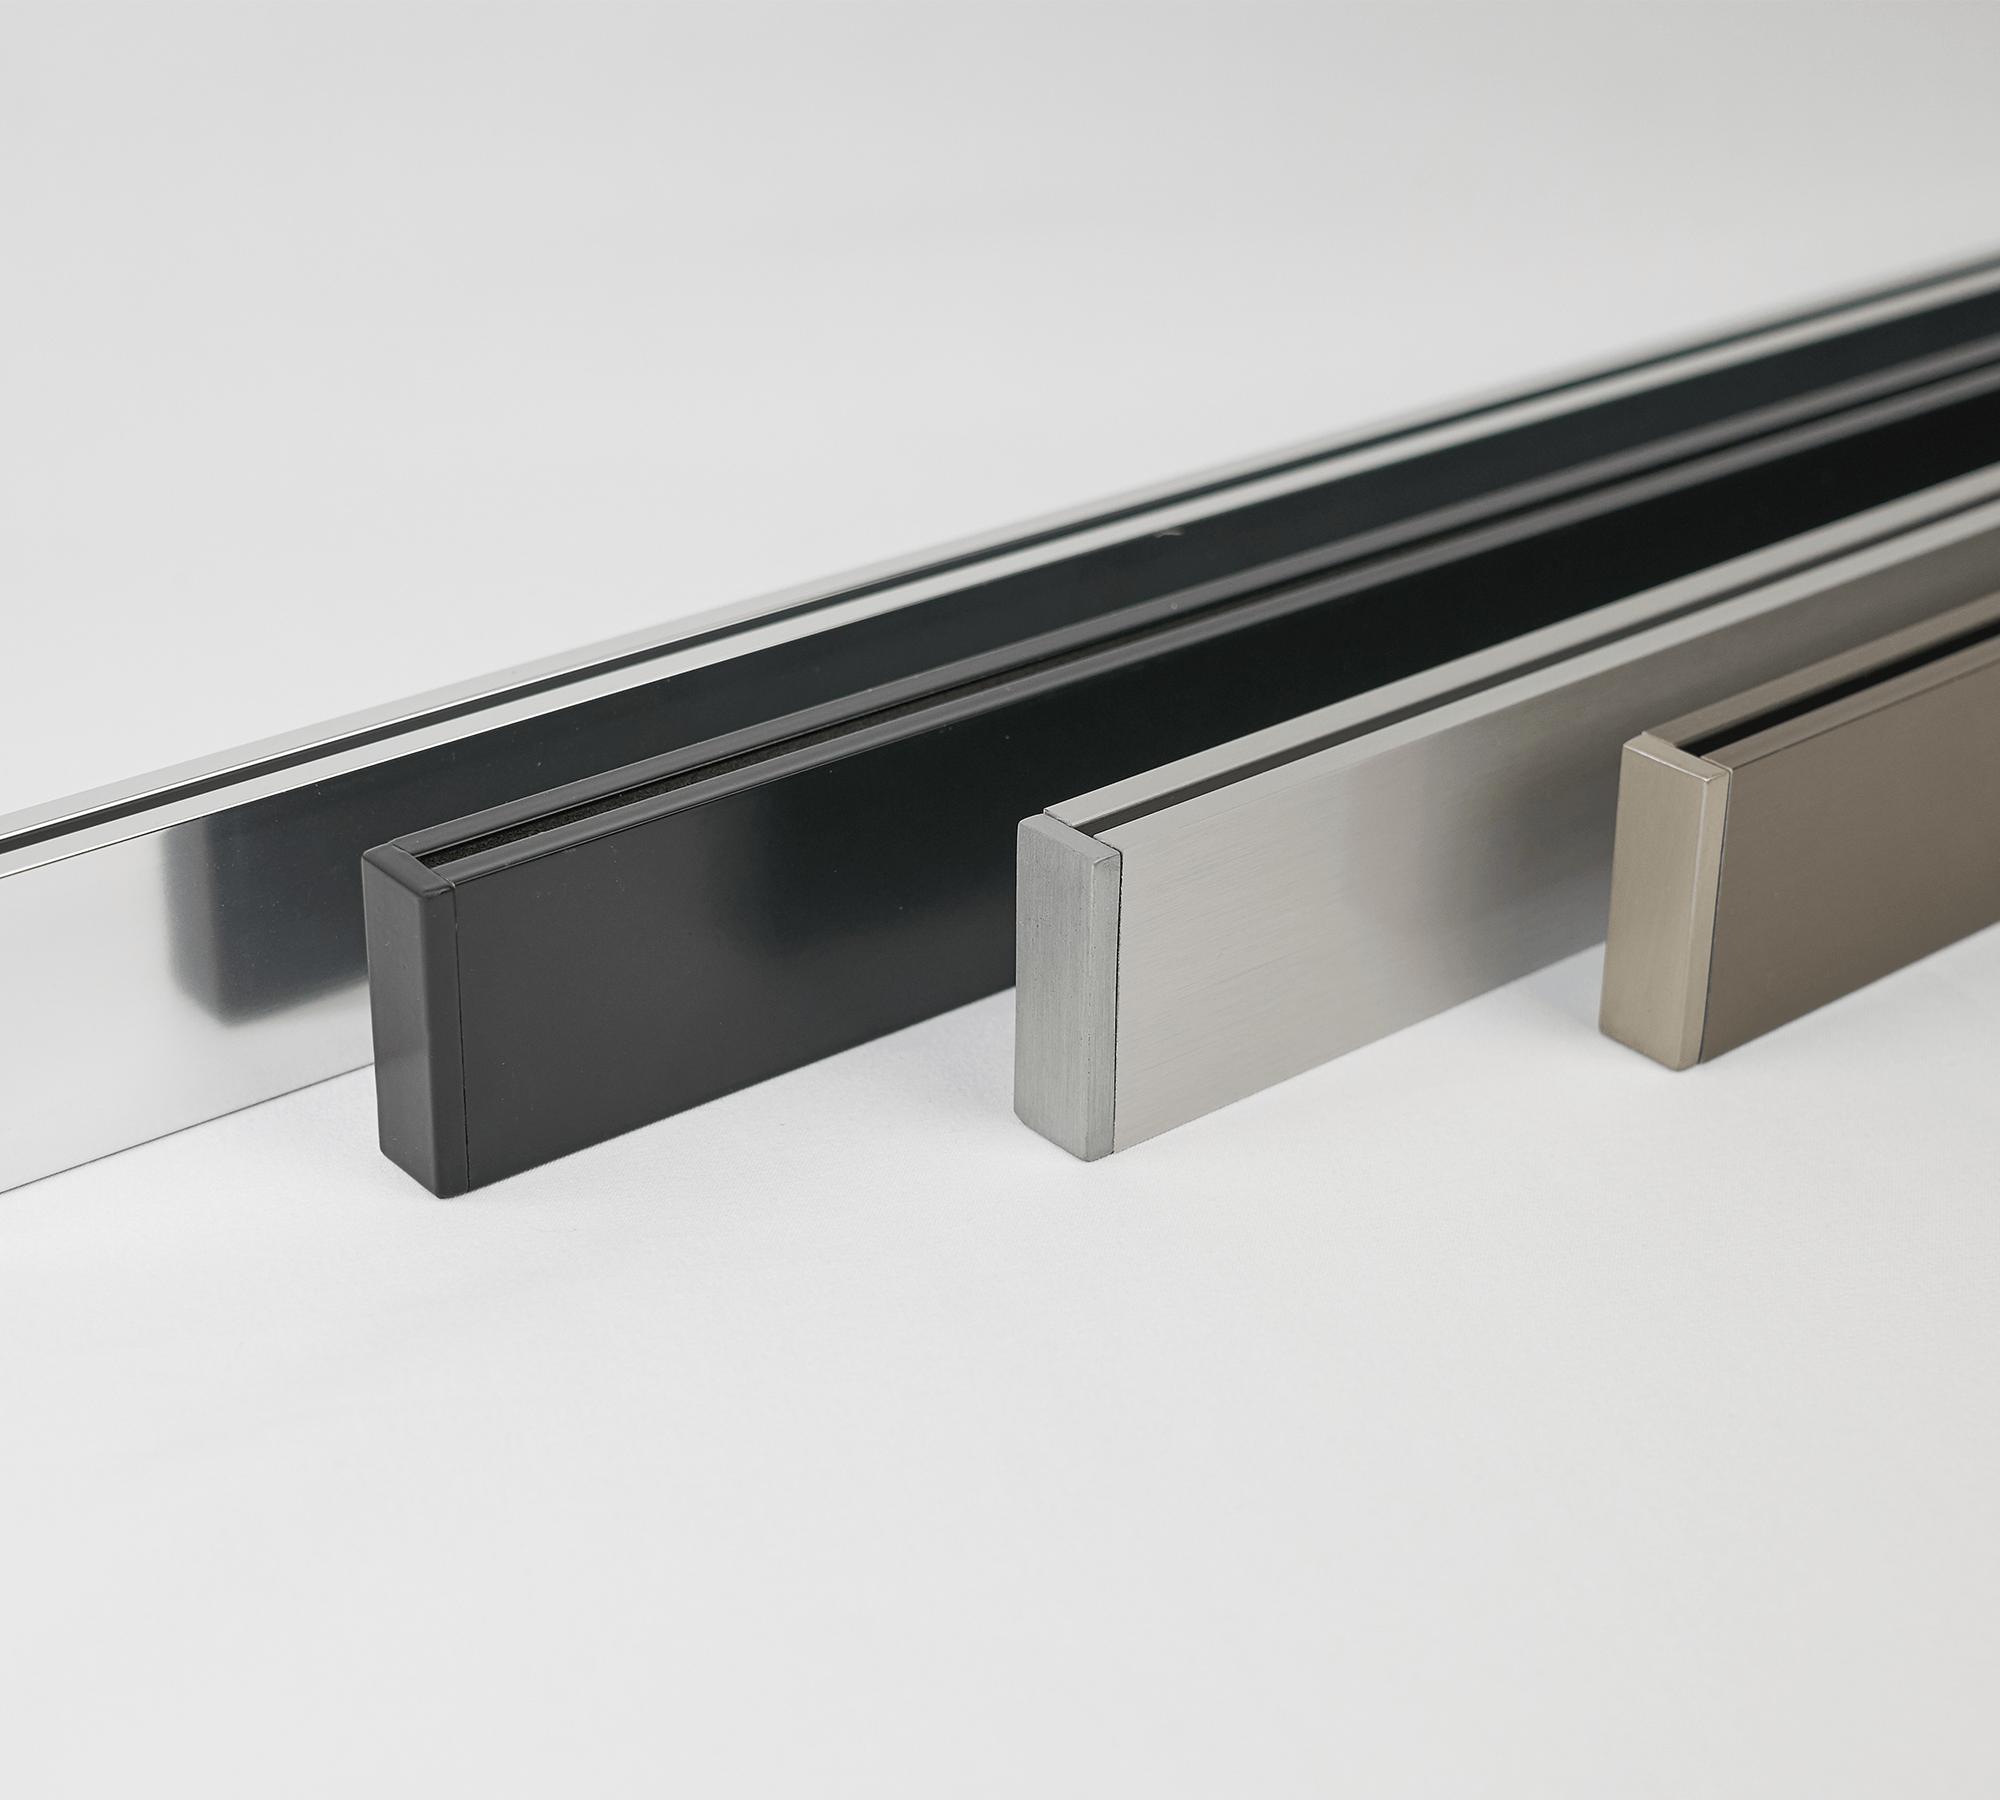 luxury slim rectangular hem bar in various colour ways